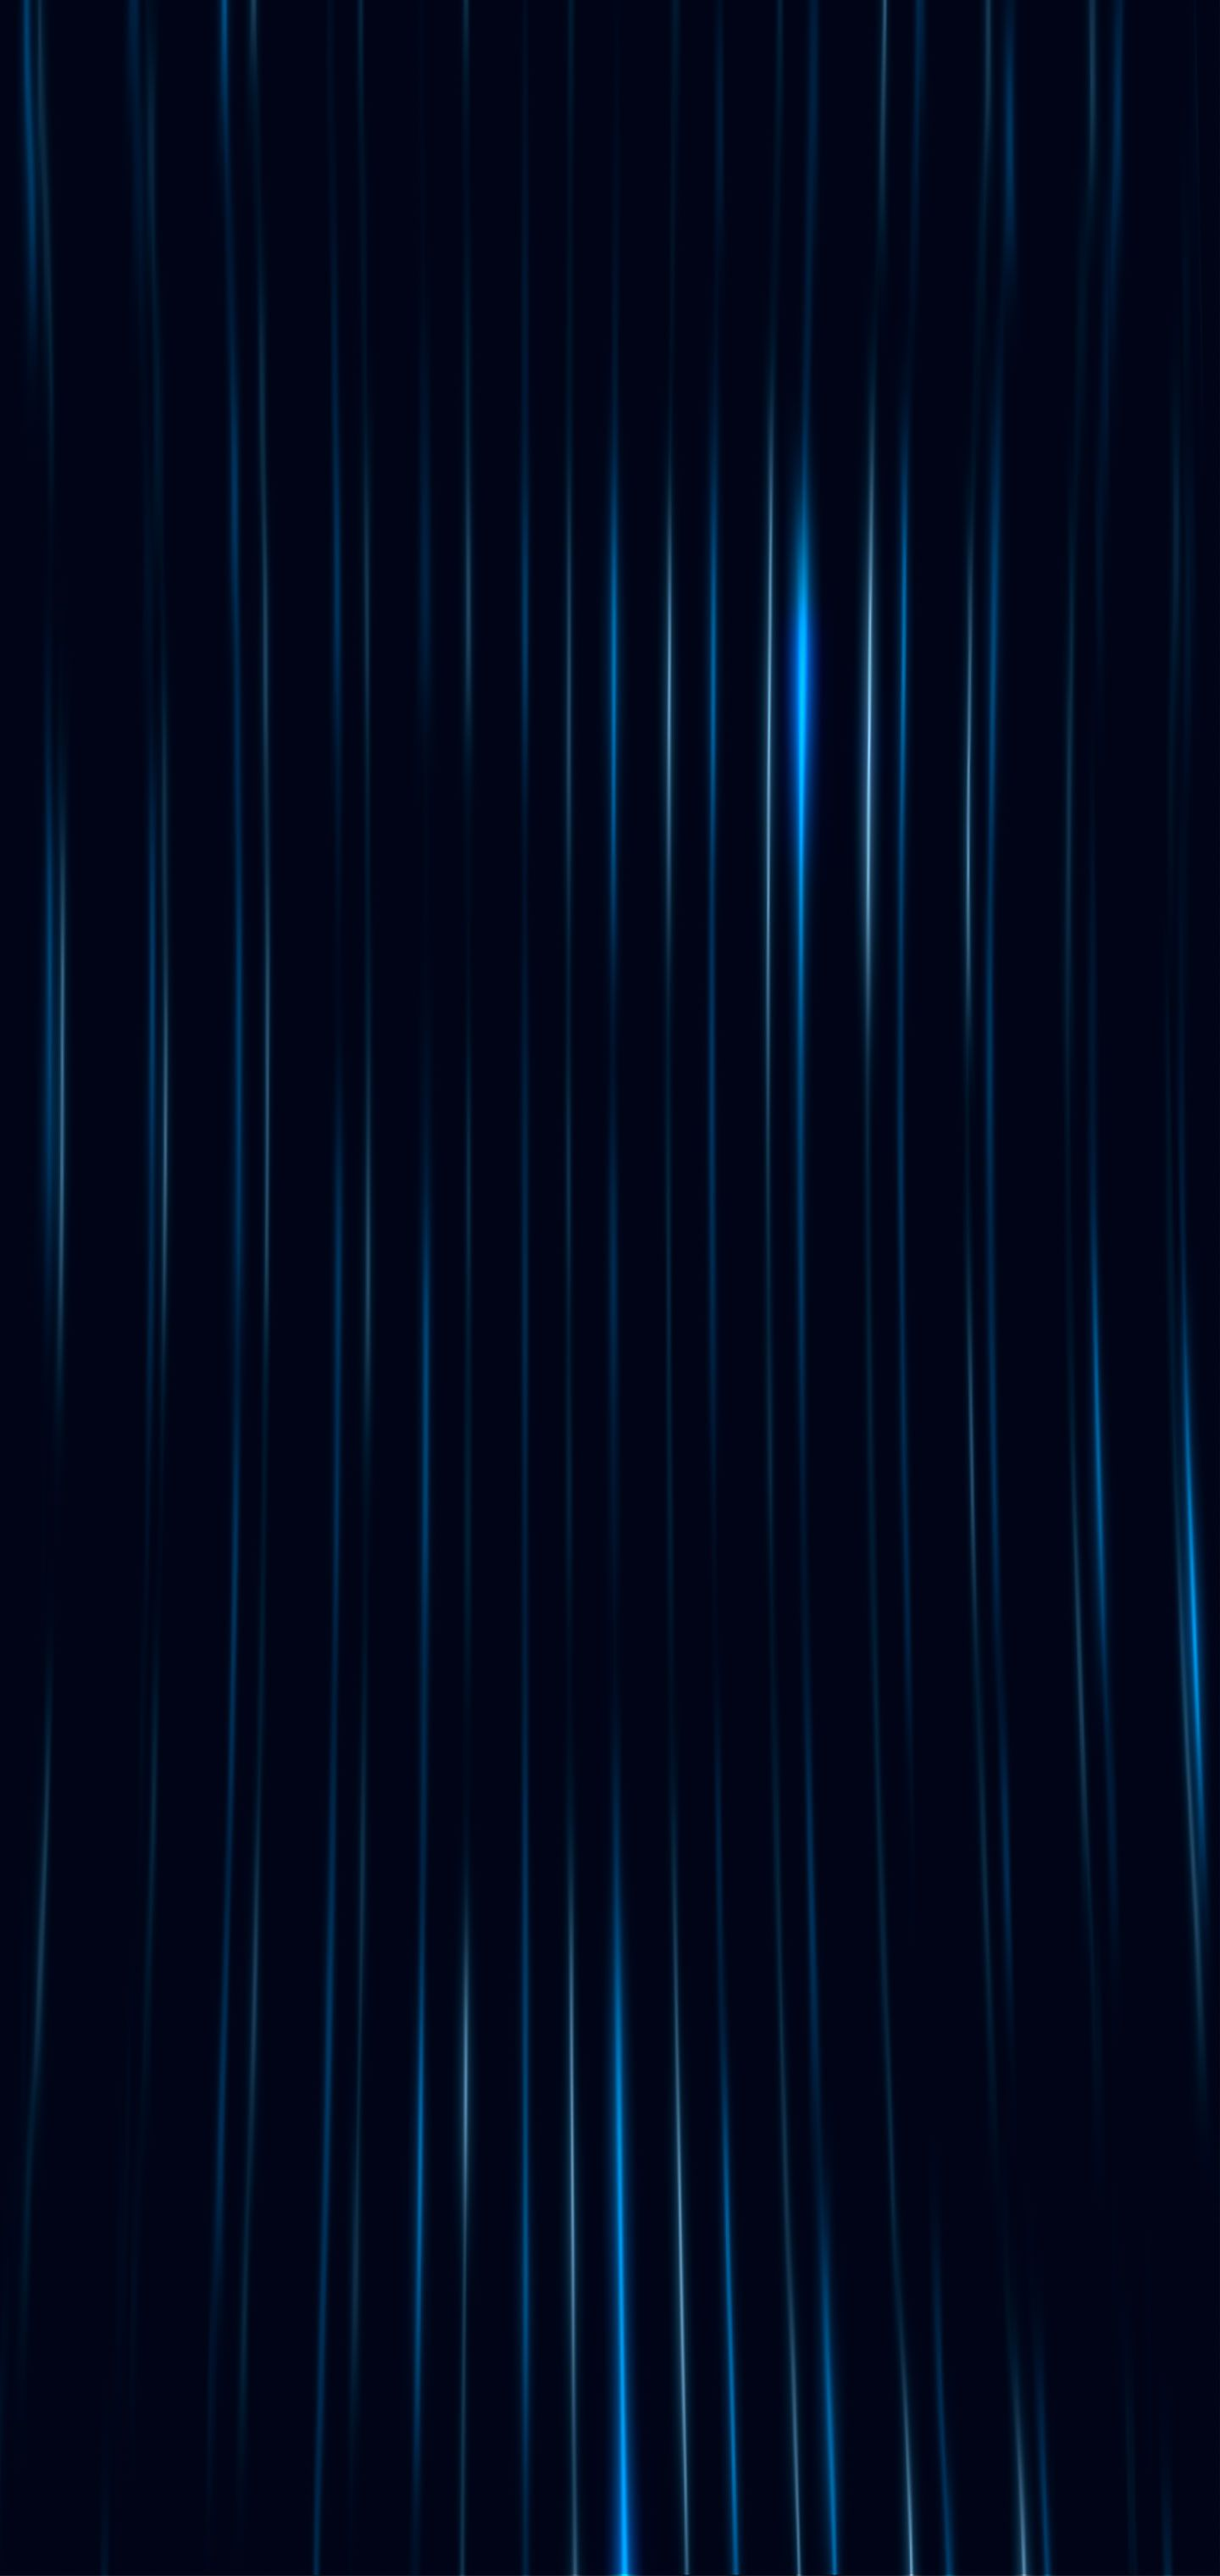 Dark Samsung Wallpapers On Wallpaperdog